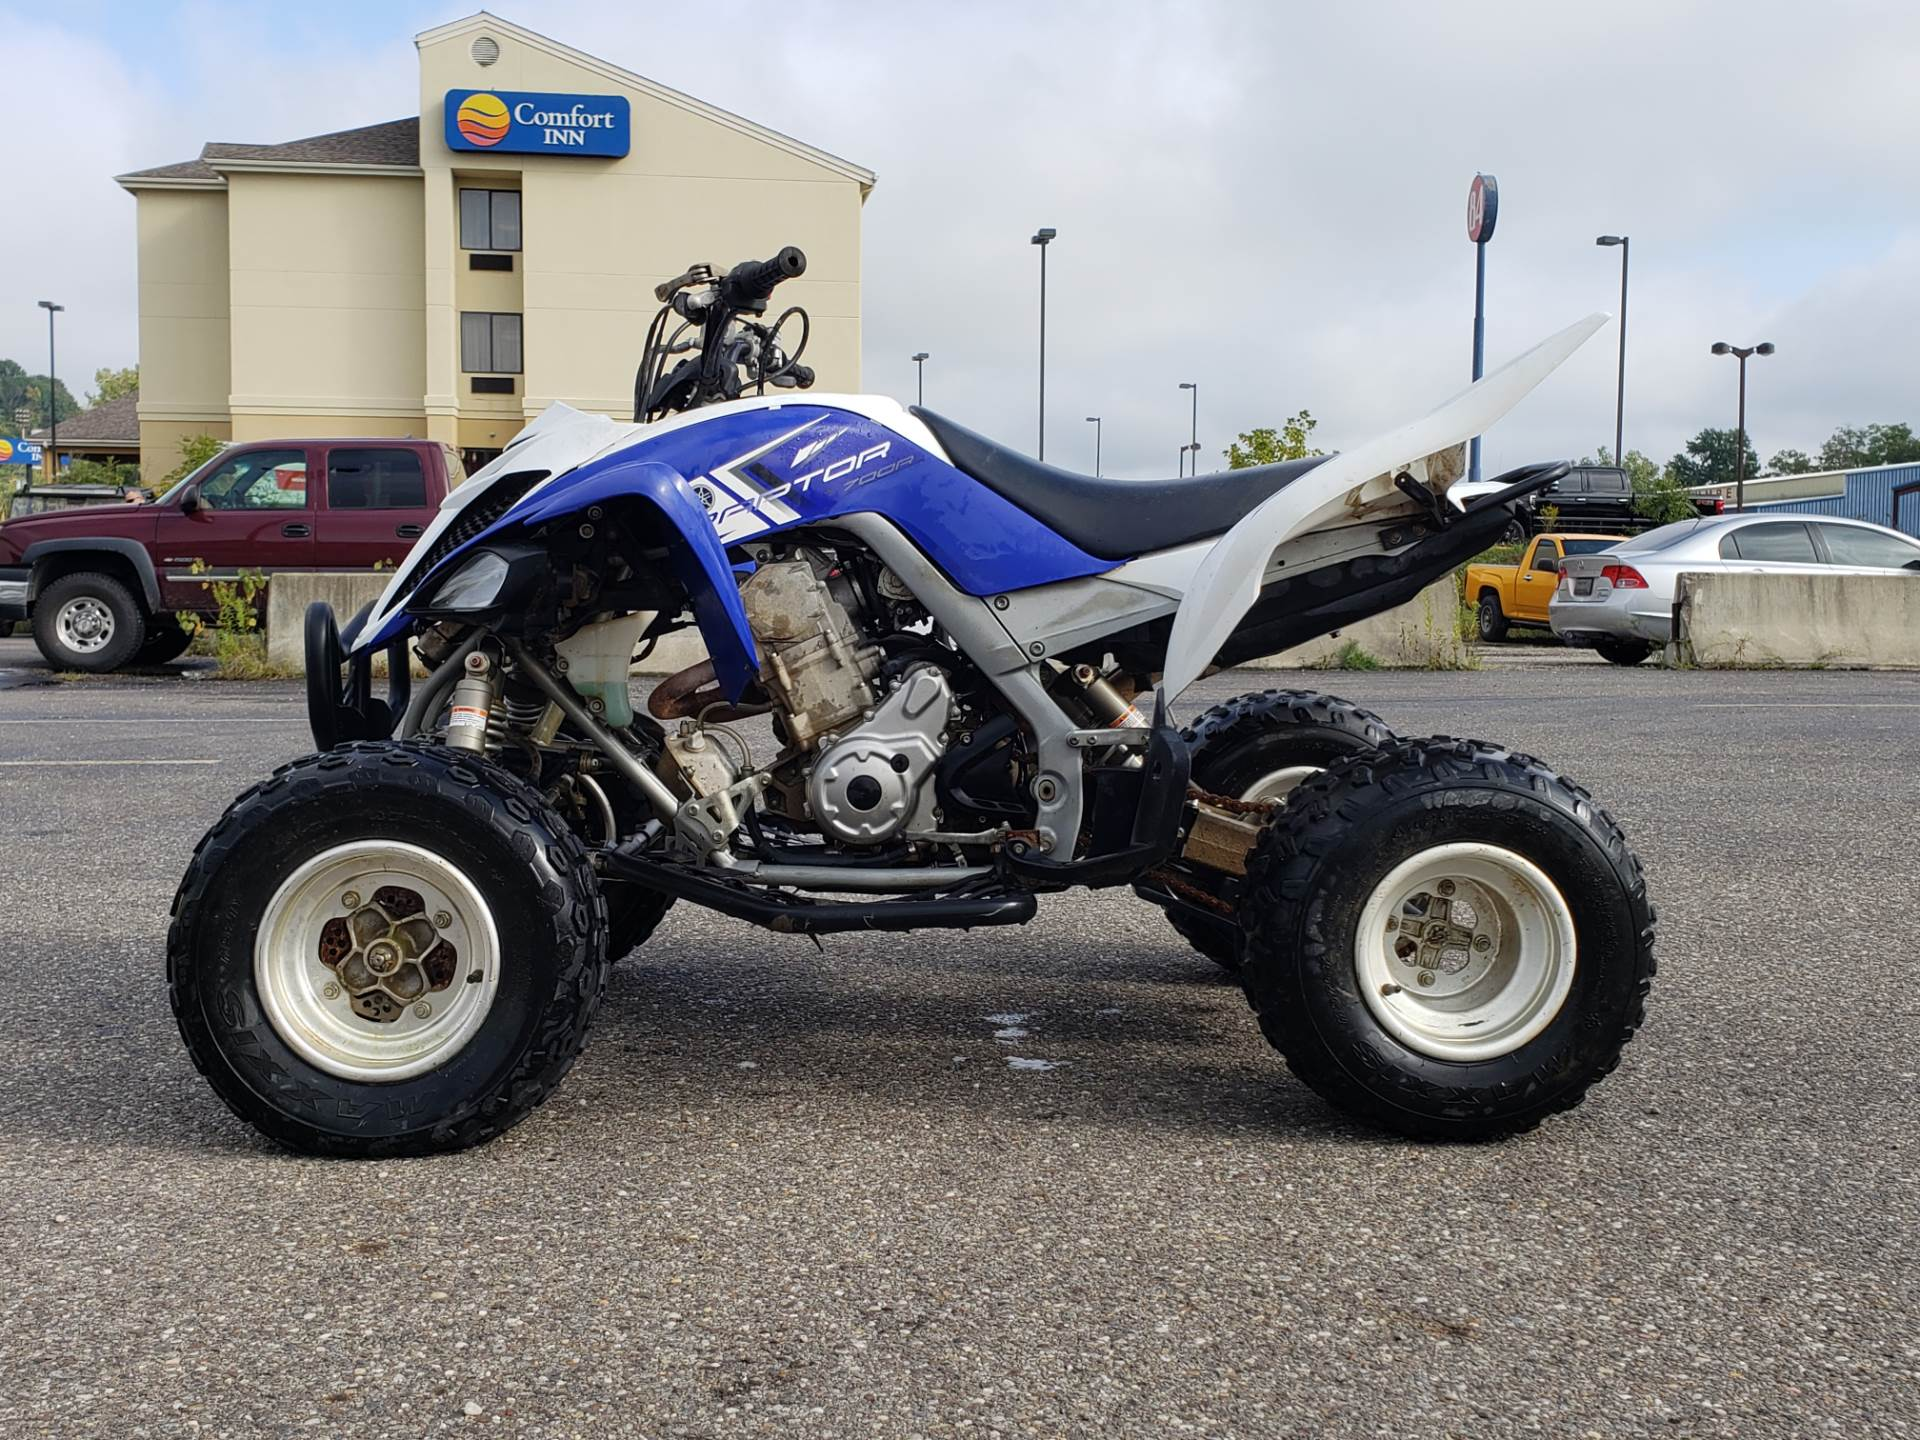 2013 Yamaha Raptor 700R 1